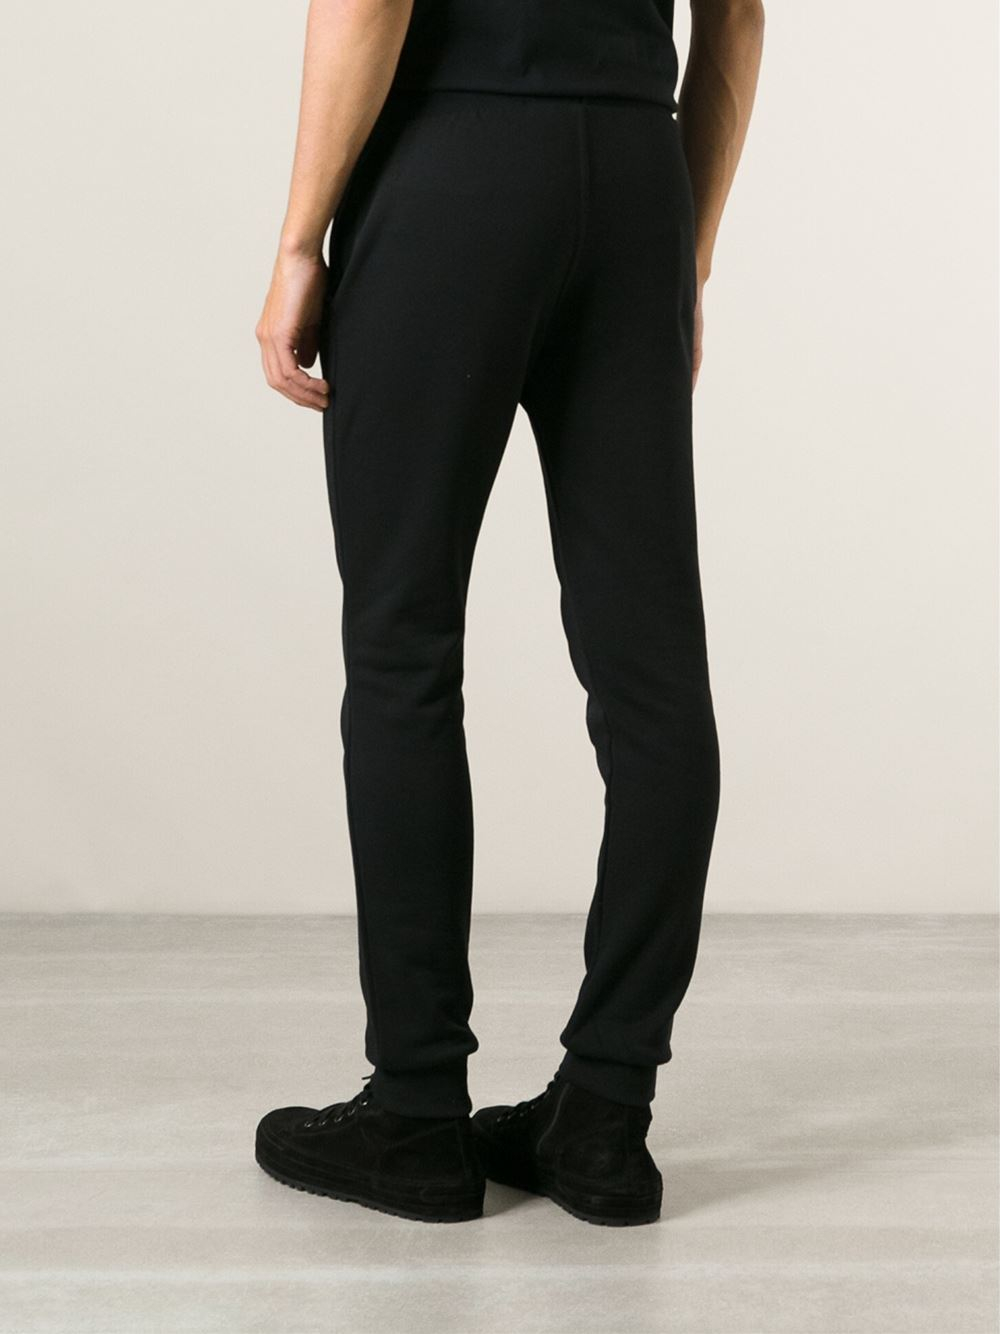 Philipp Plein Skinny Jogging Trousers in Black for Men